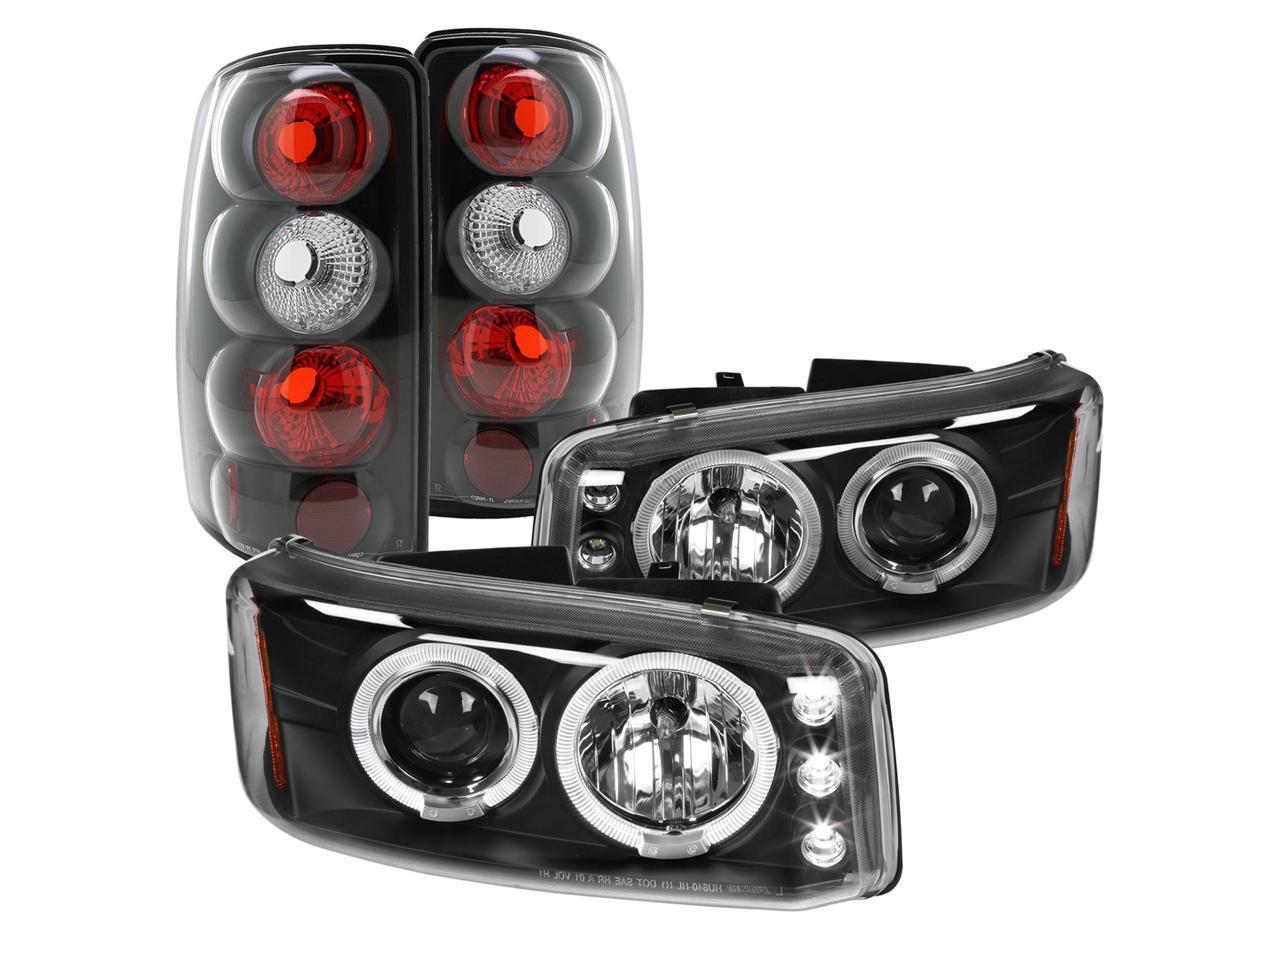 Spec D Tuning For 2000 2006 Gmc Yukon Denali Euro Black Dual Halo Projector Headlights Tail Lamps Left Right 2000 2001 2002 2003 2004 2005 2006 Newegg Com